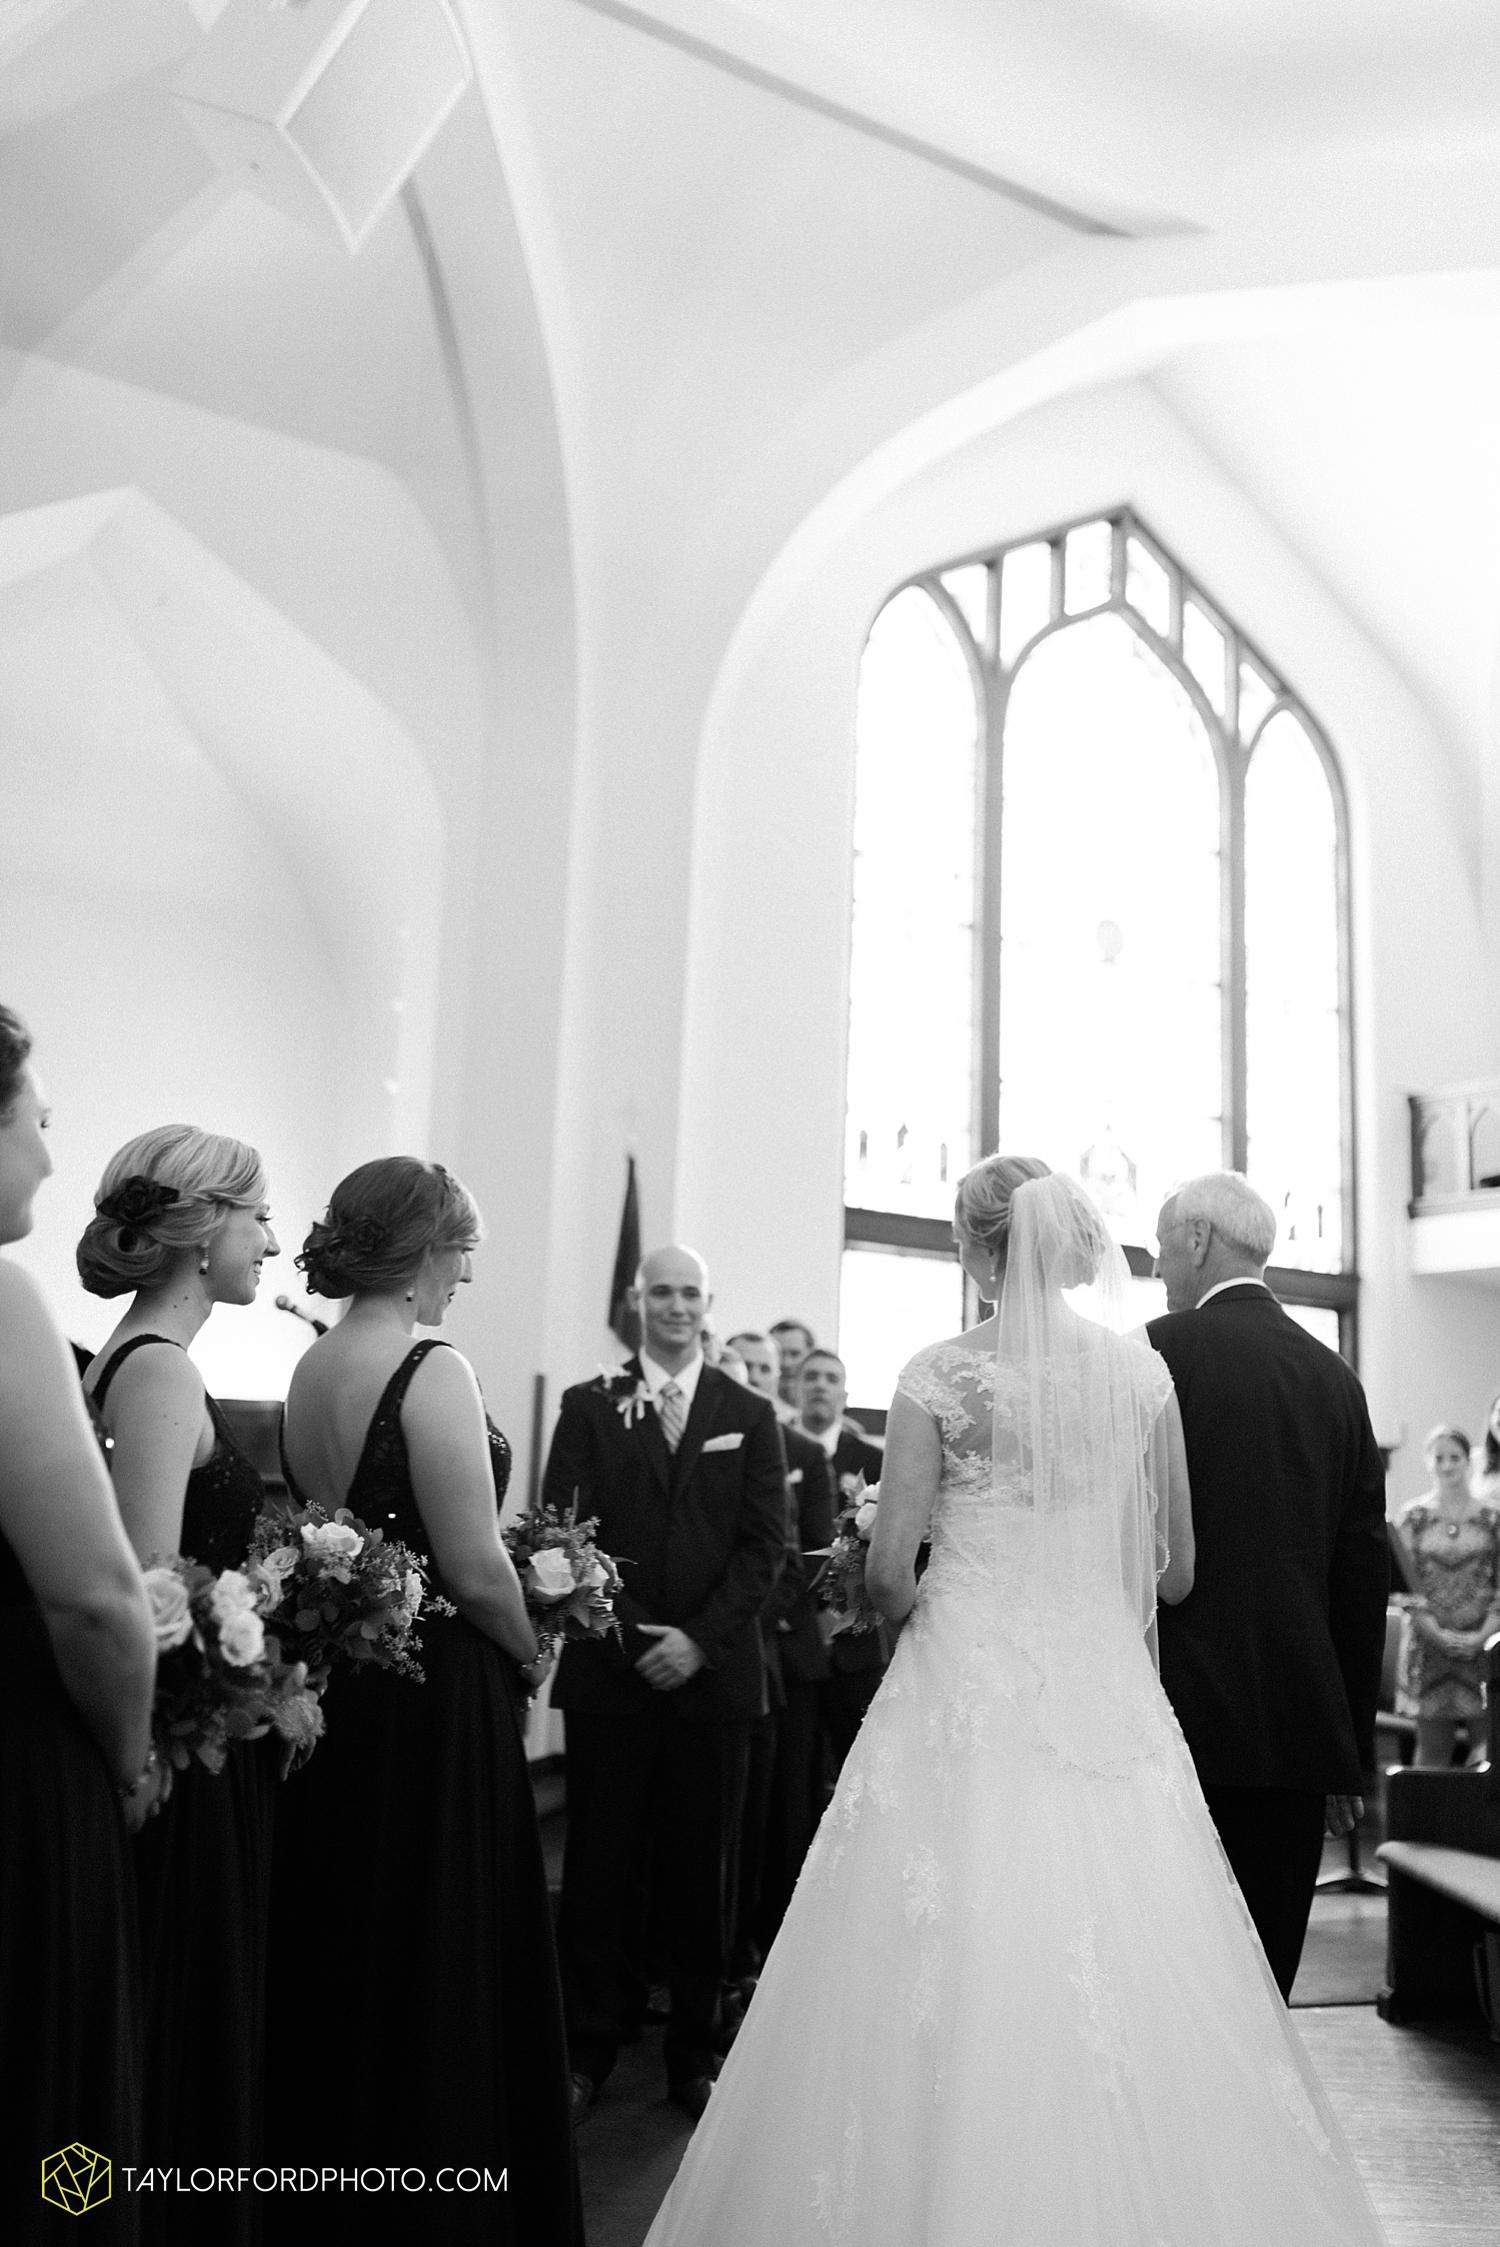 van_wert_ohio_fort_wayne_indiana__photographer_taylor_ford_nashville_tennessee_family_wedding_senior_cerutis_catering_2475.jpg